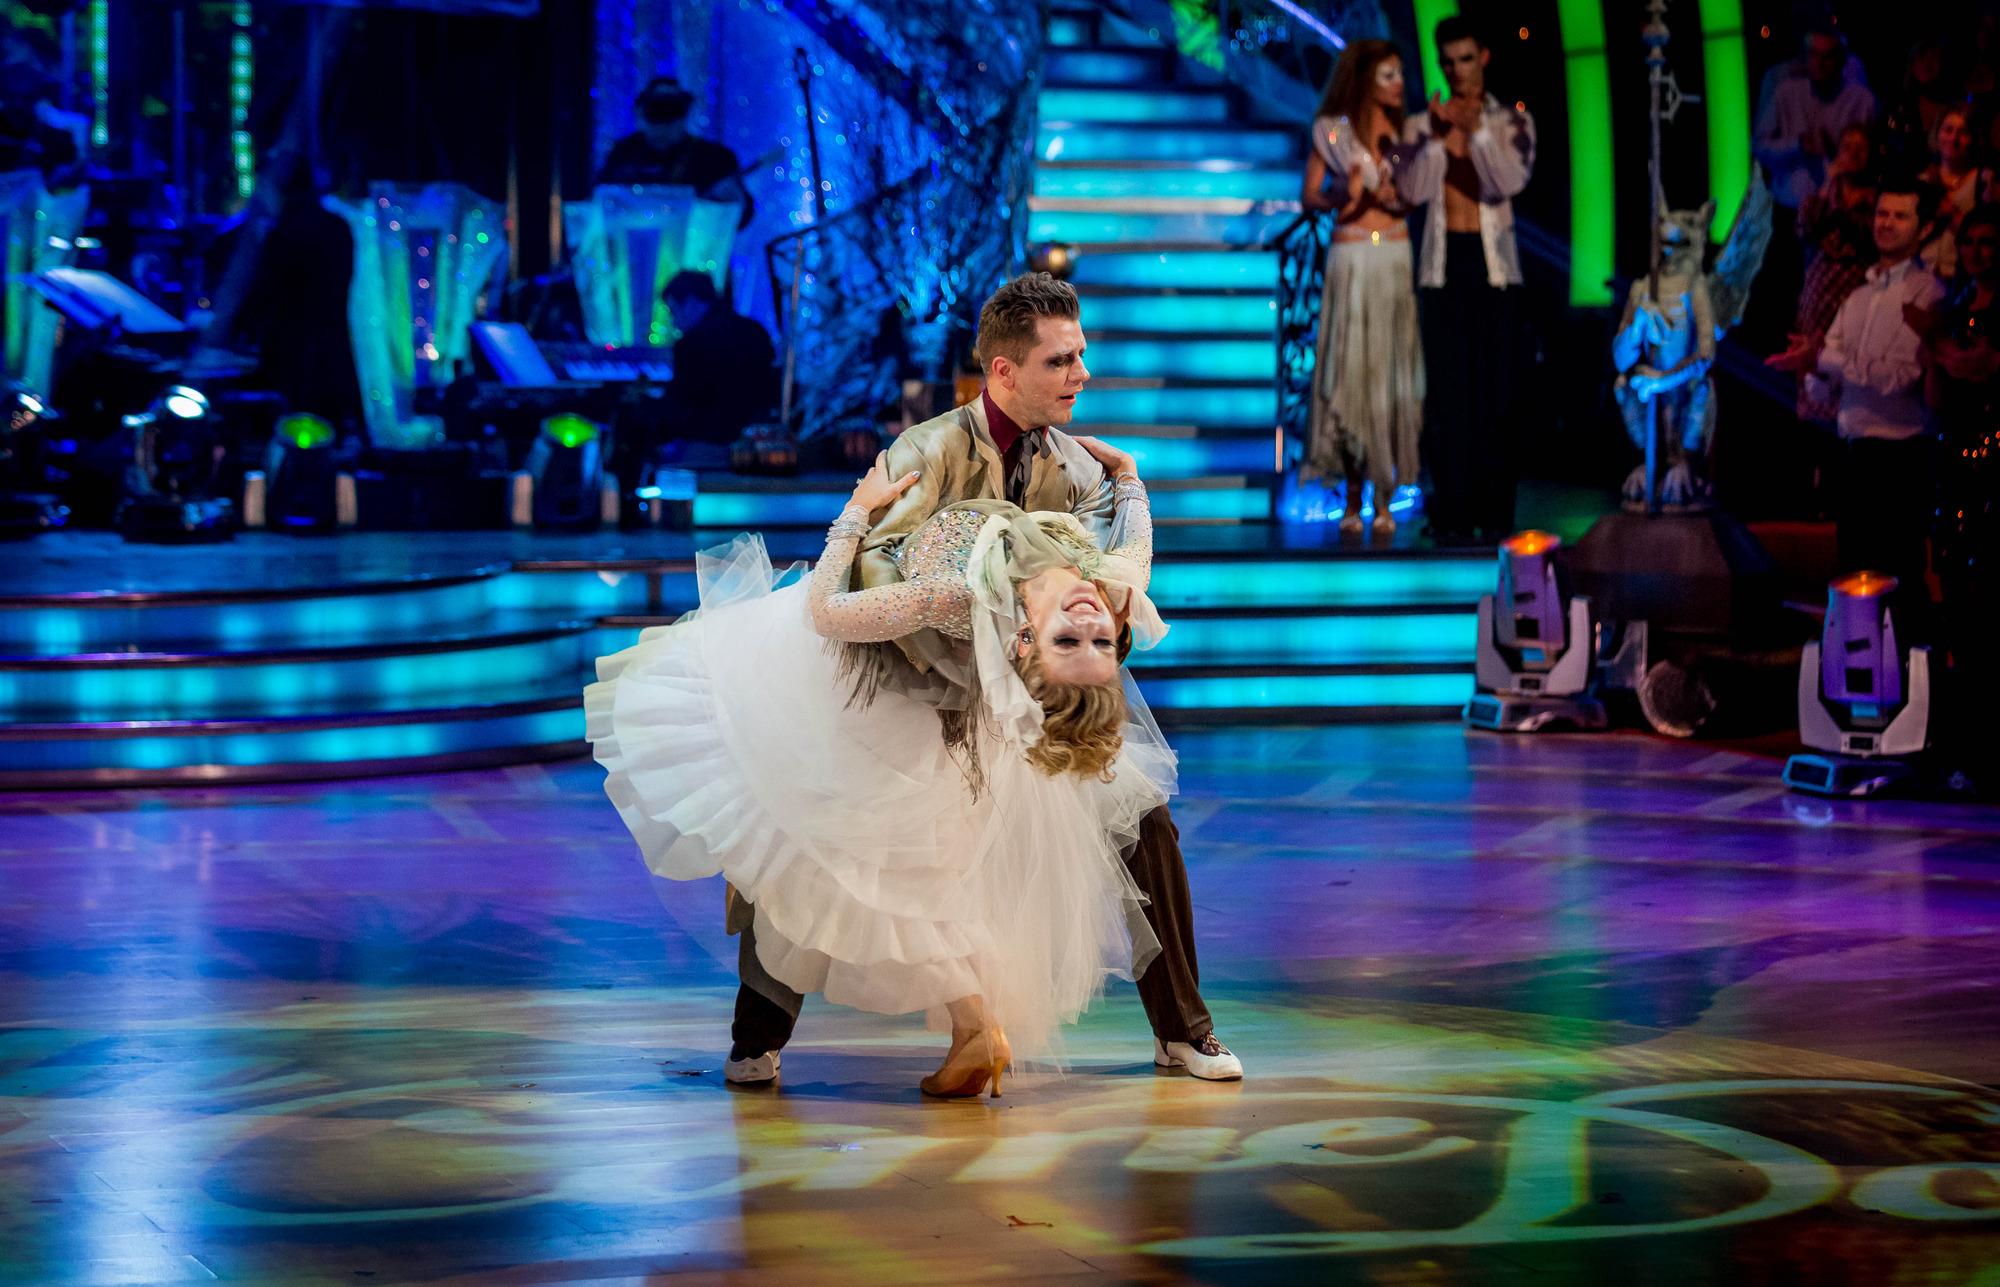 Rachel and Pasha take their final dance Rachel Riley, Pasha Kovalev - (C) BBC - Photographer: Guy Levy